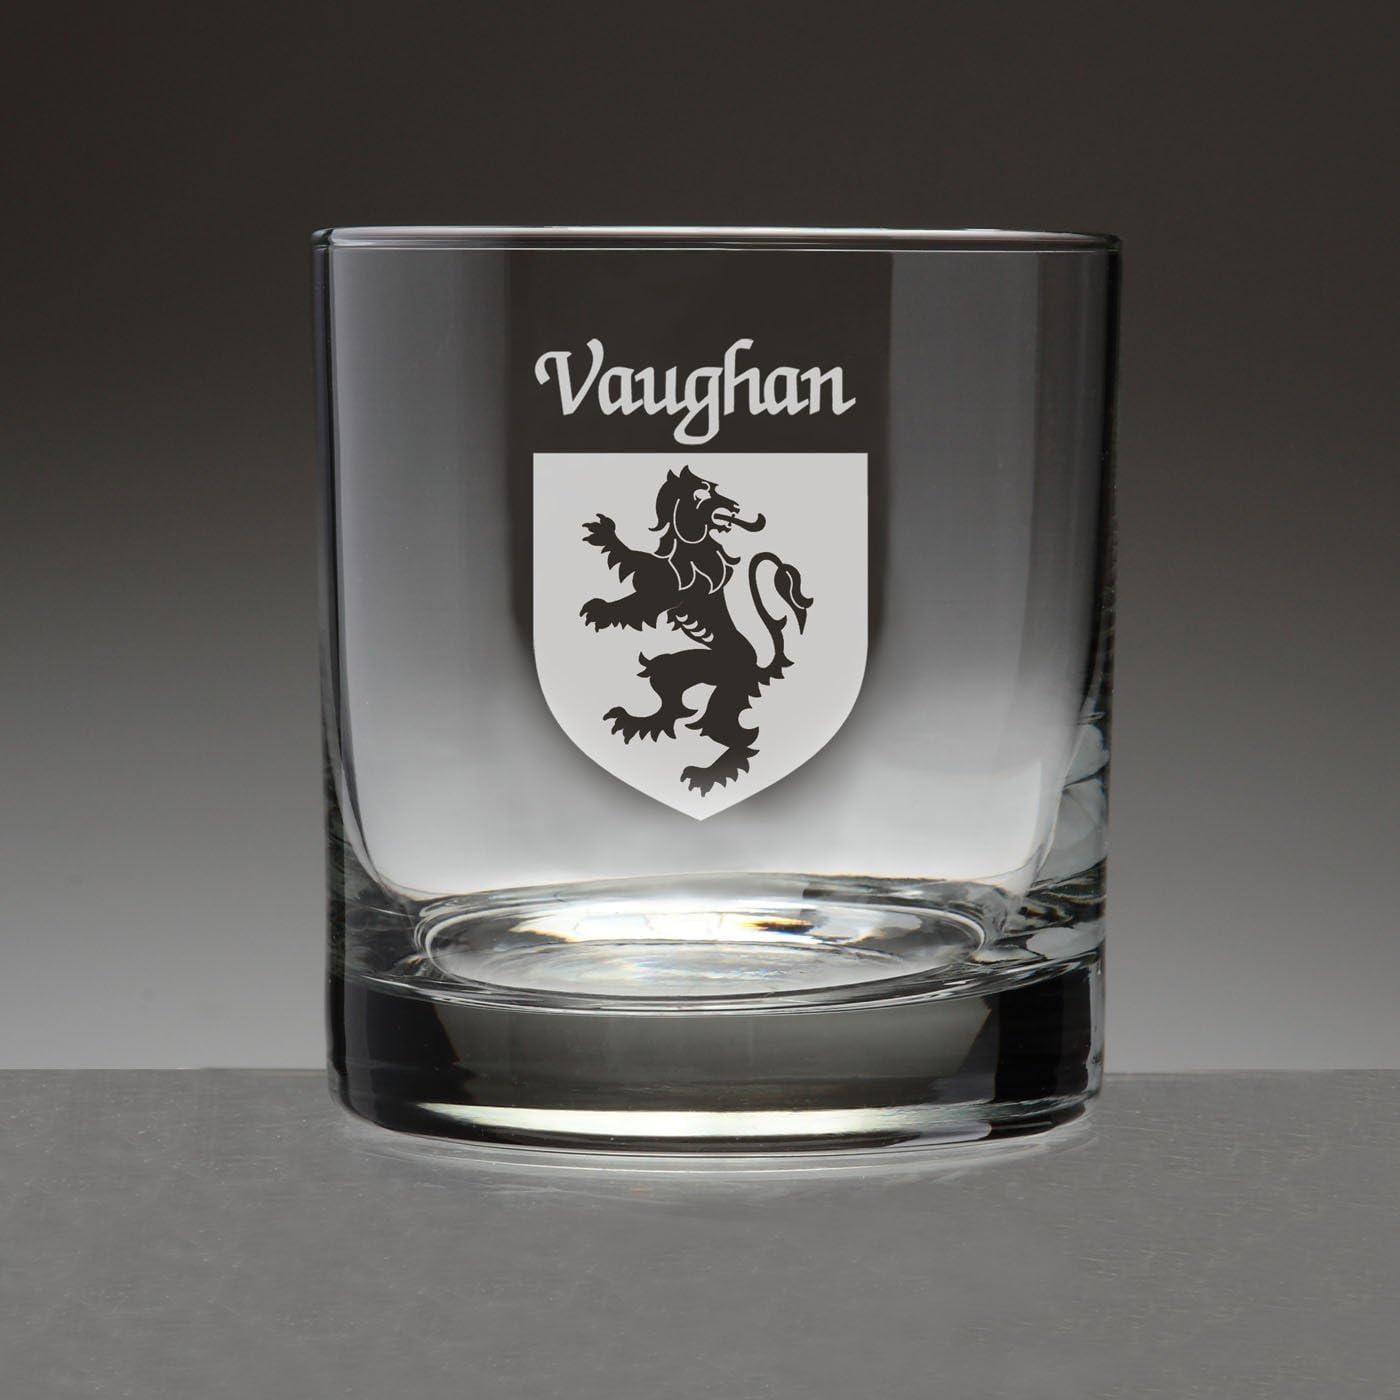 Vaughan Irish Coat of Max 46% OFF Arms 5 ☆ popular Tumbler Etch 4 Sand Glasses Set -